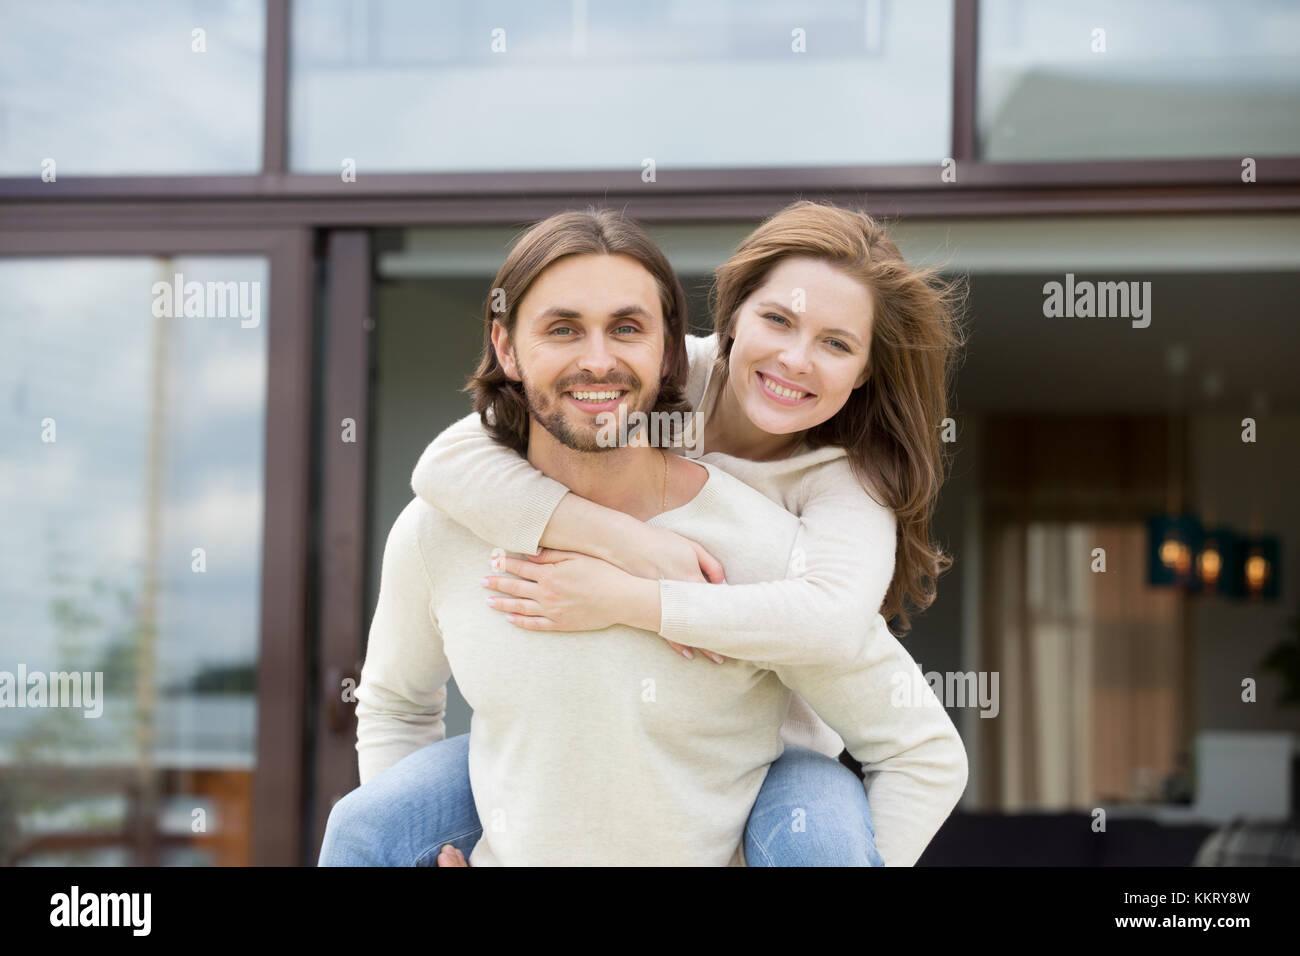 Mann, Frau, Draußen, an der Kamera suchen, Porträt Stockbild